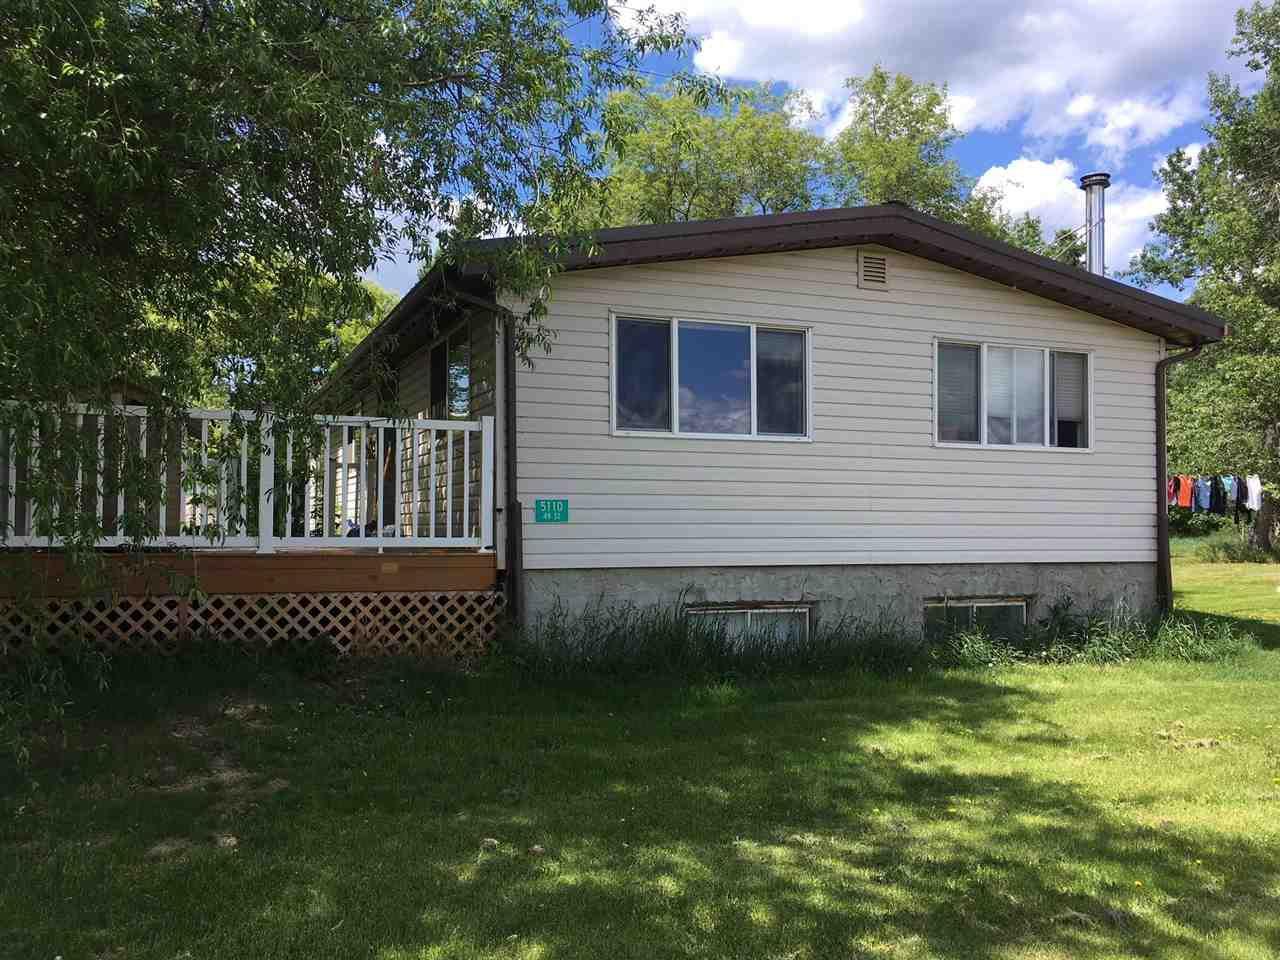 Main Photo: 5110 49 Street: Newbrook House for sale : MLS®# E4120893